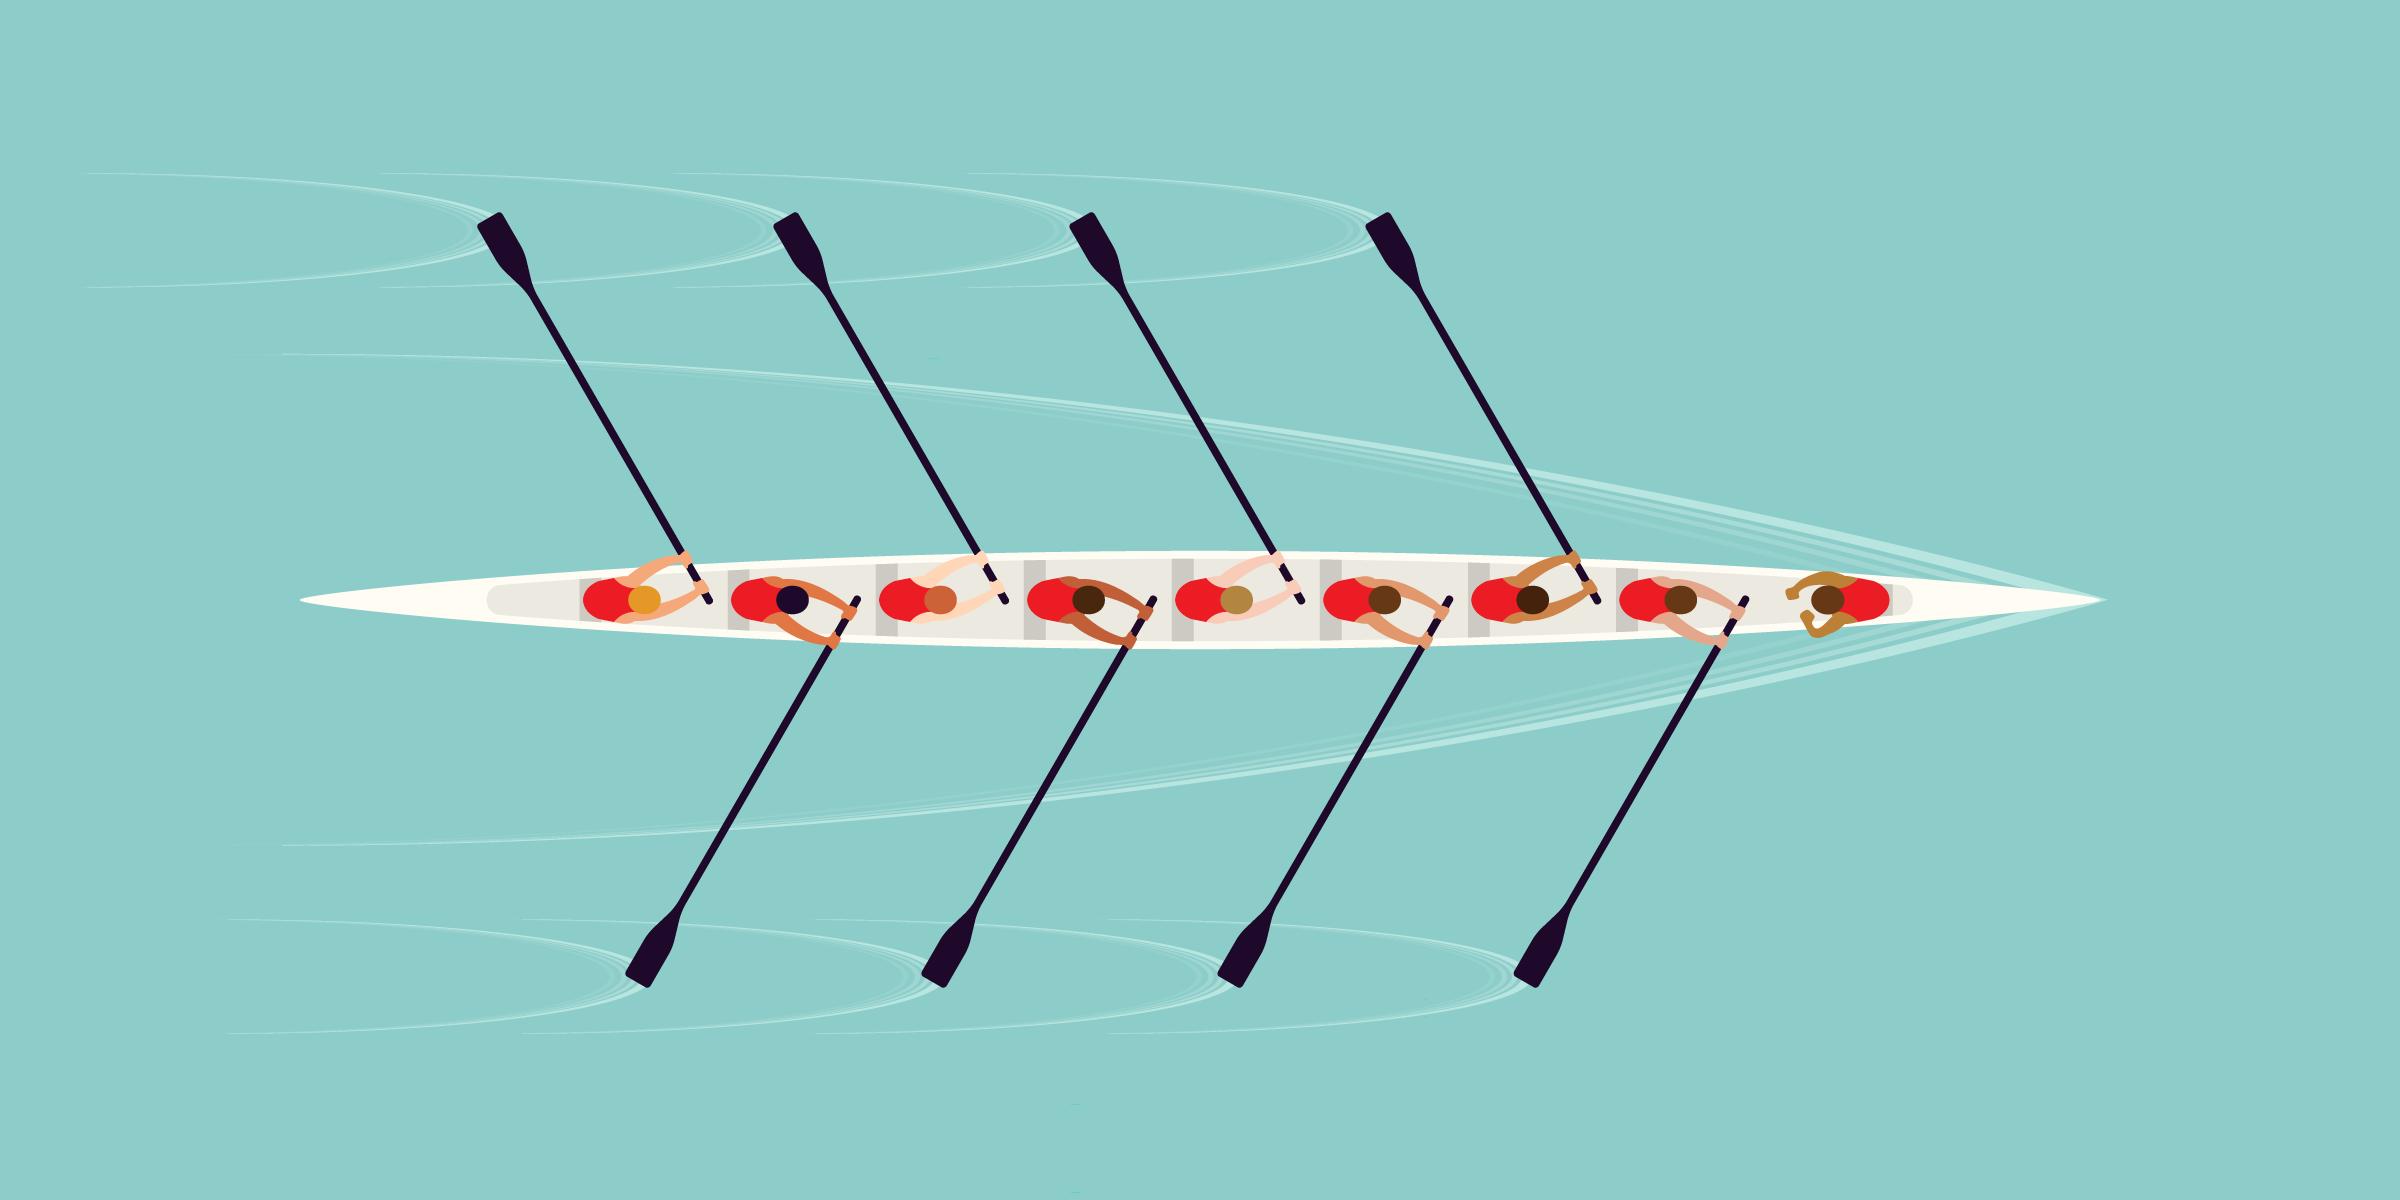 Image of rowing crew